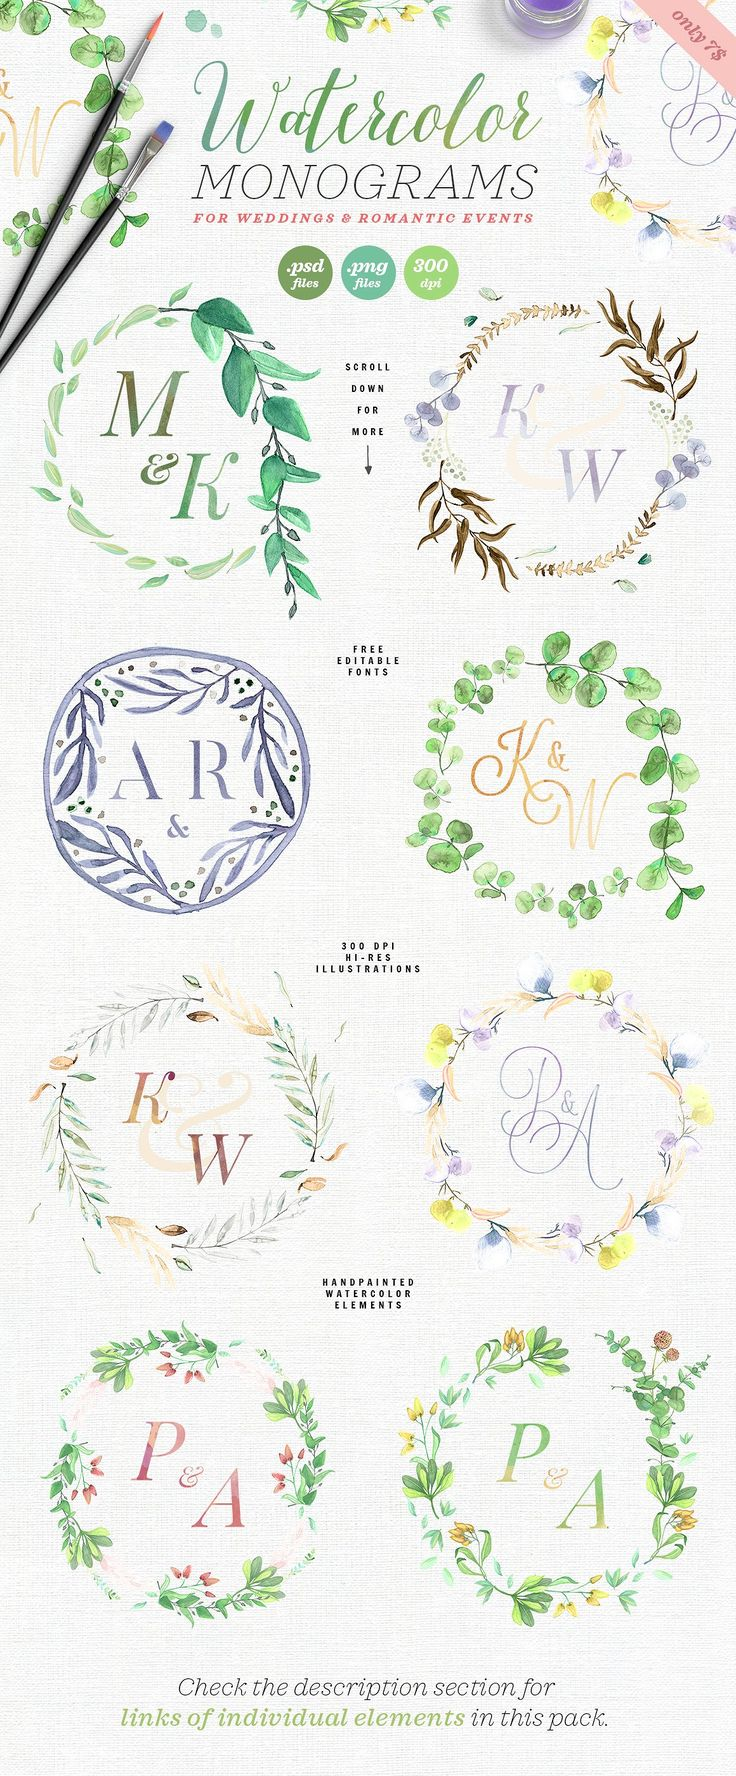 8 Watercolor Wedding Monograms I by The Wedding Shop on @creativemarket